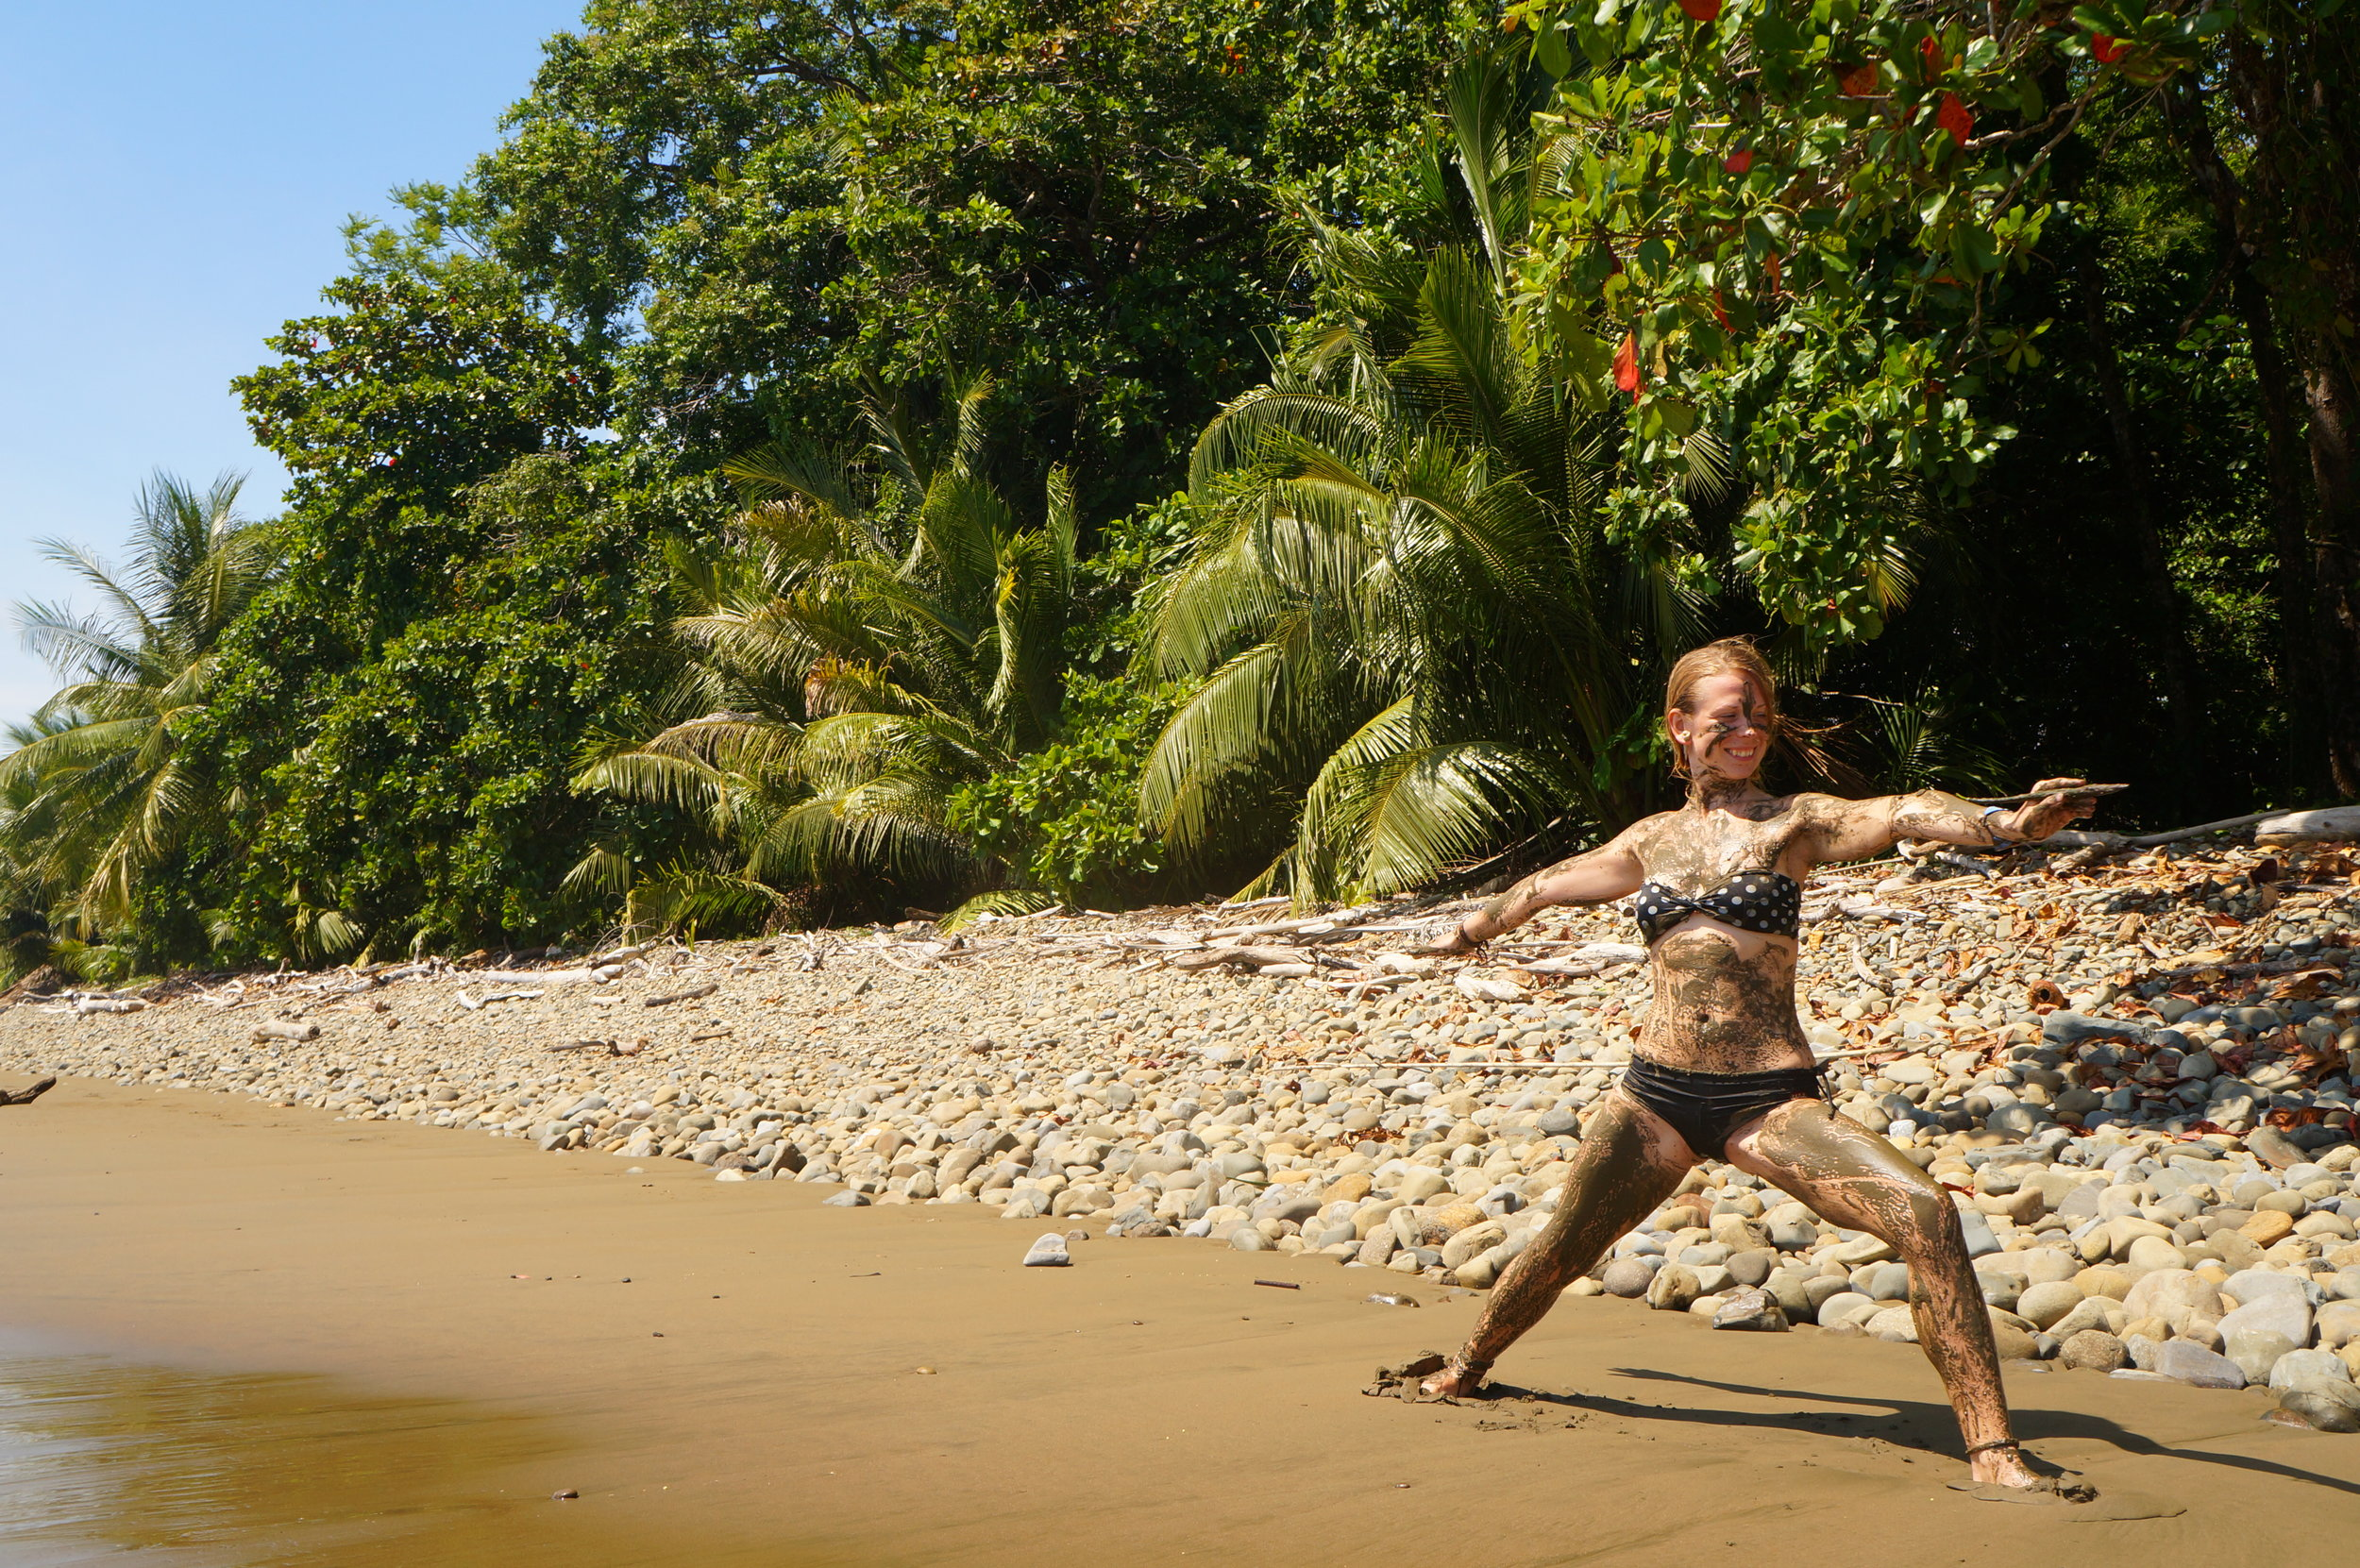 Virabhadrasana /Warrior/ II West Coast, Costa Rica